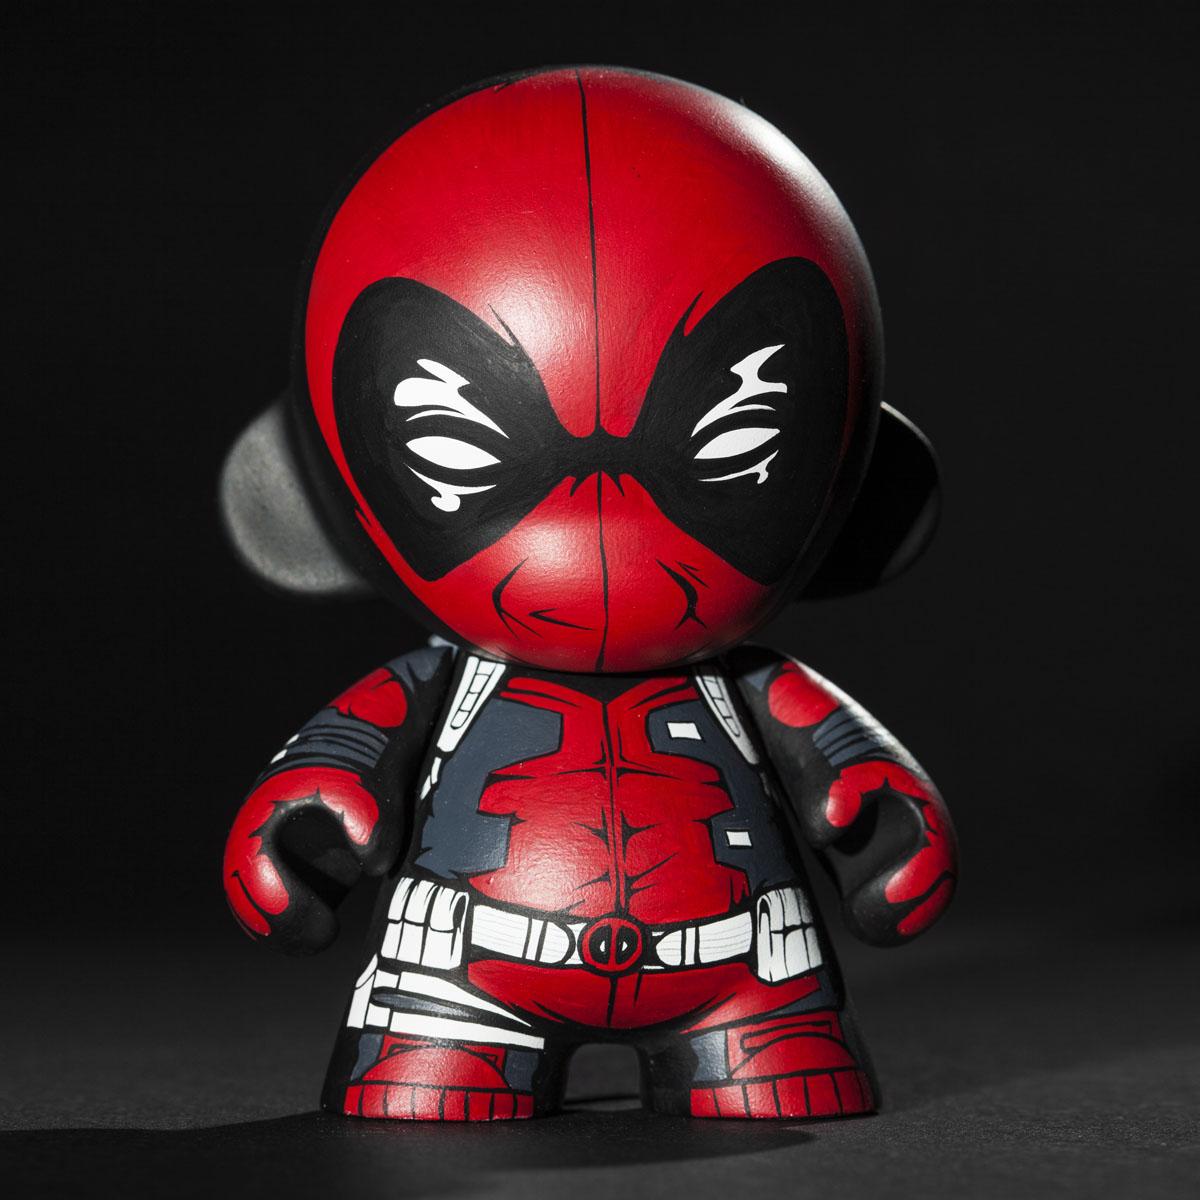 Custom Deadpool Mini Munny By Jpk Clutter Magazine